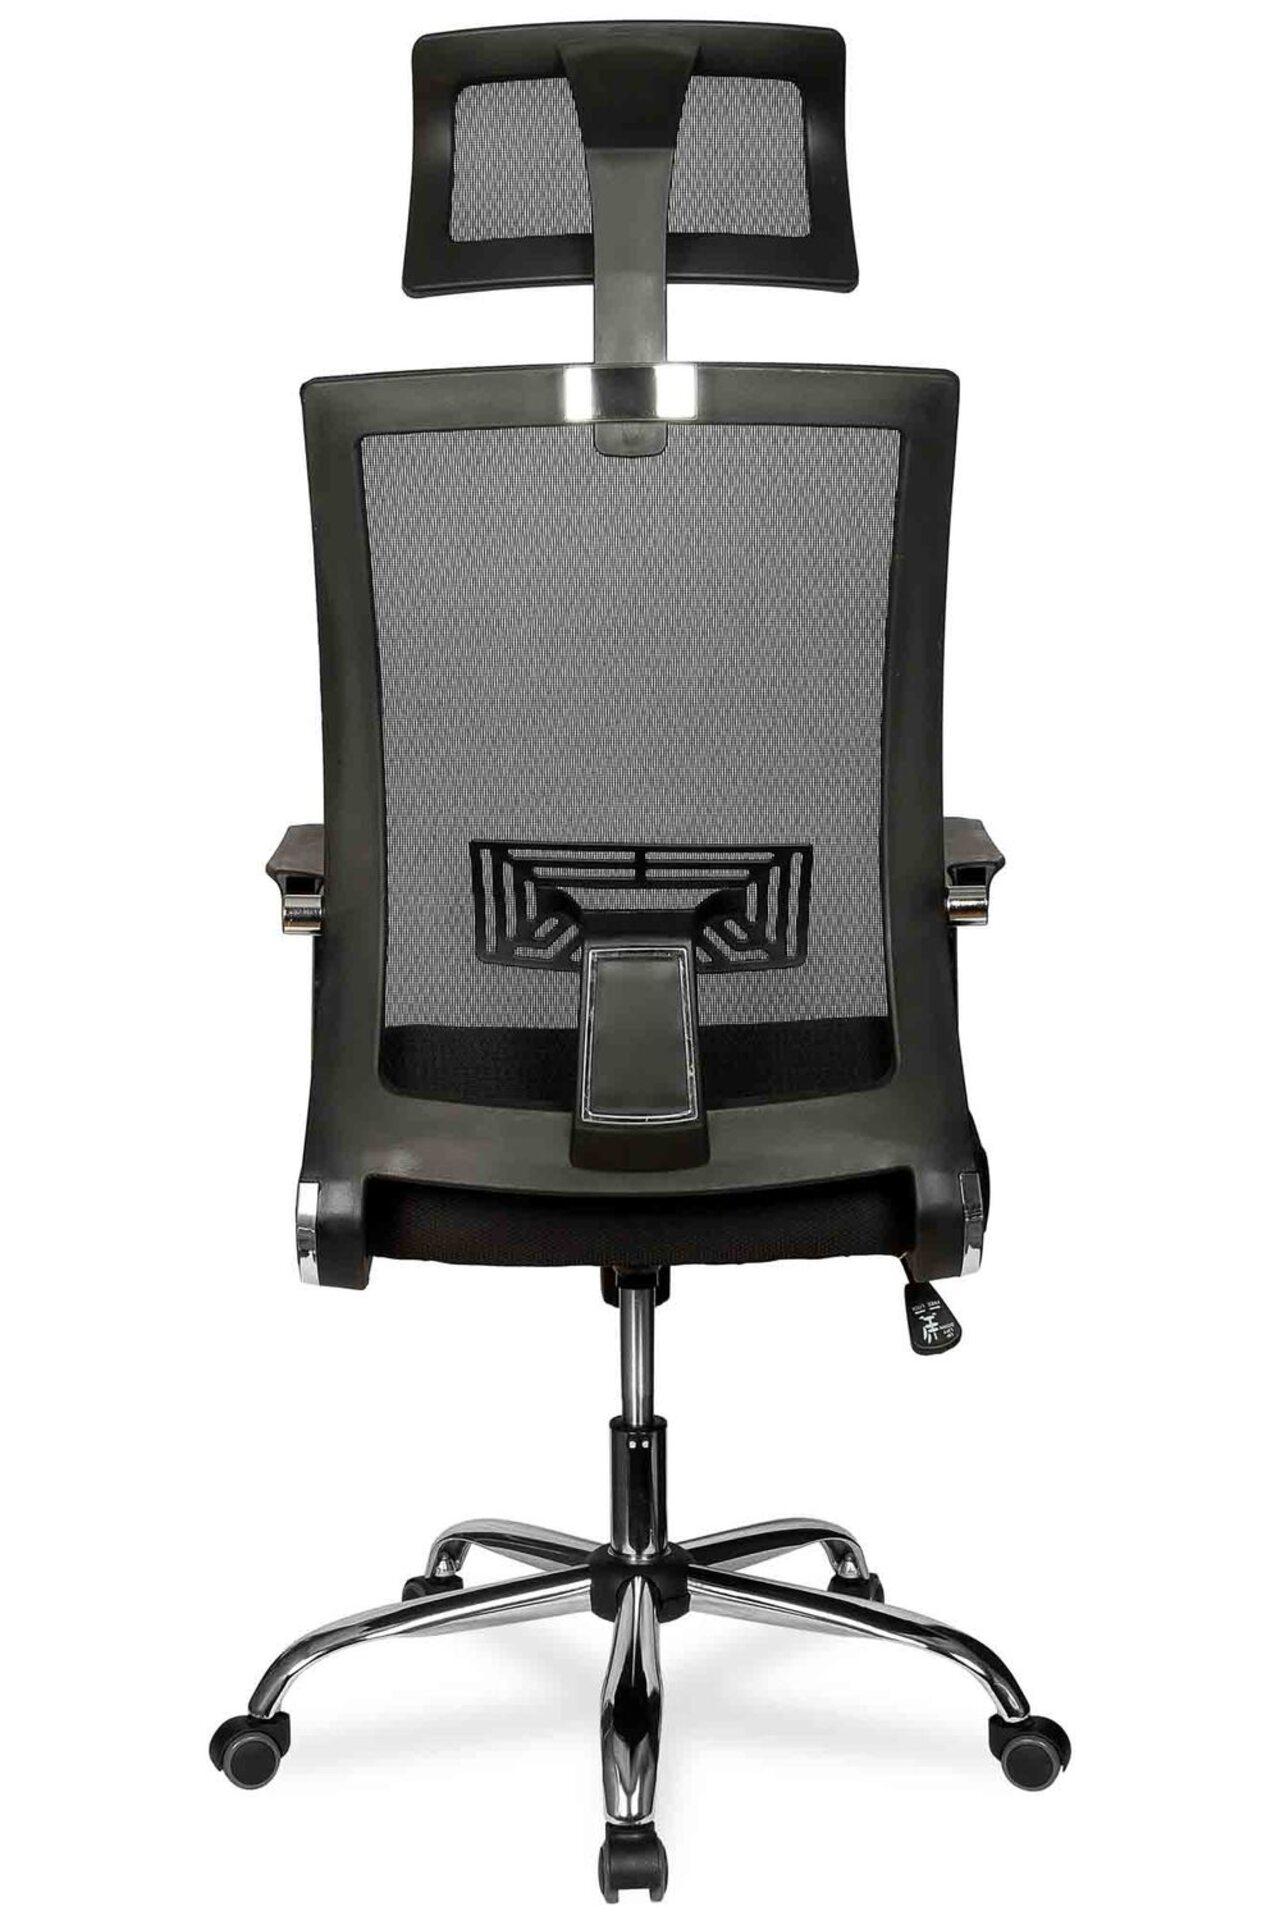 Кресло руководителя College CLG-423 MXH-A - фото 2